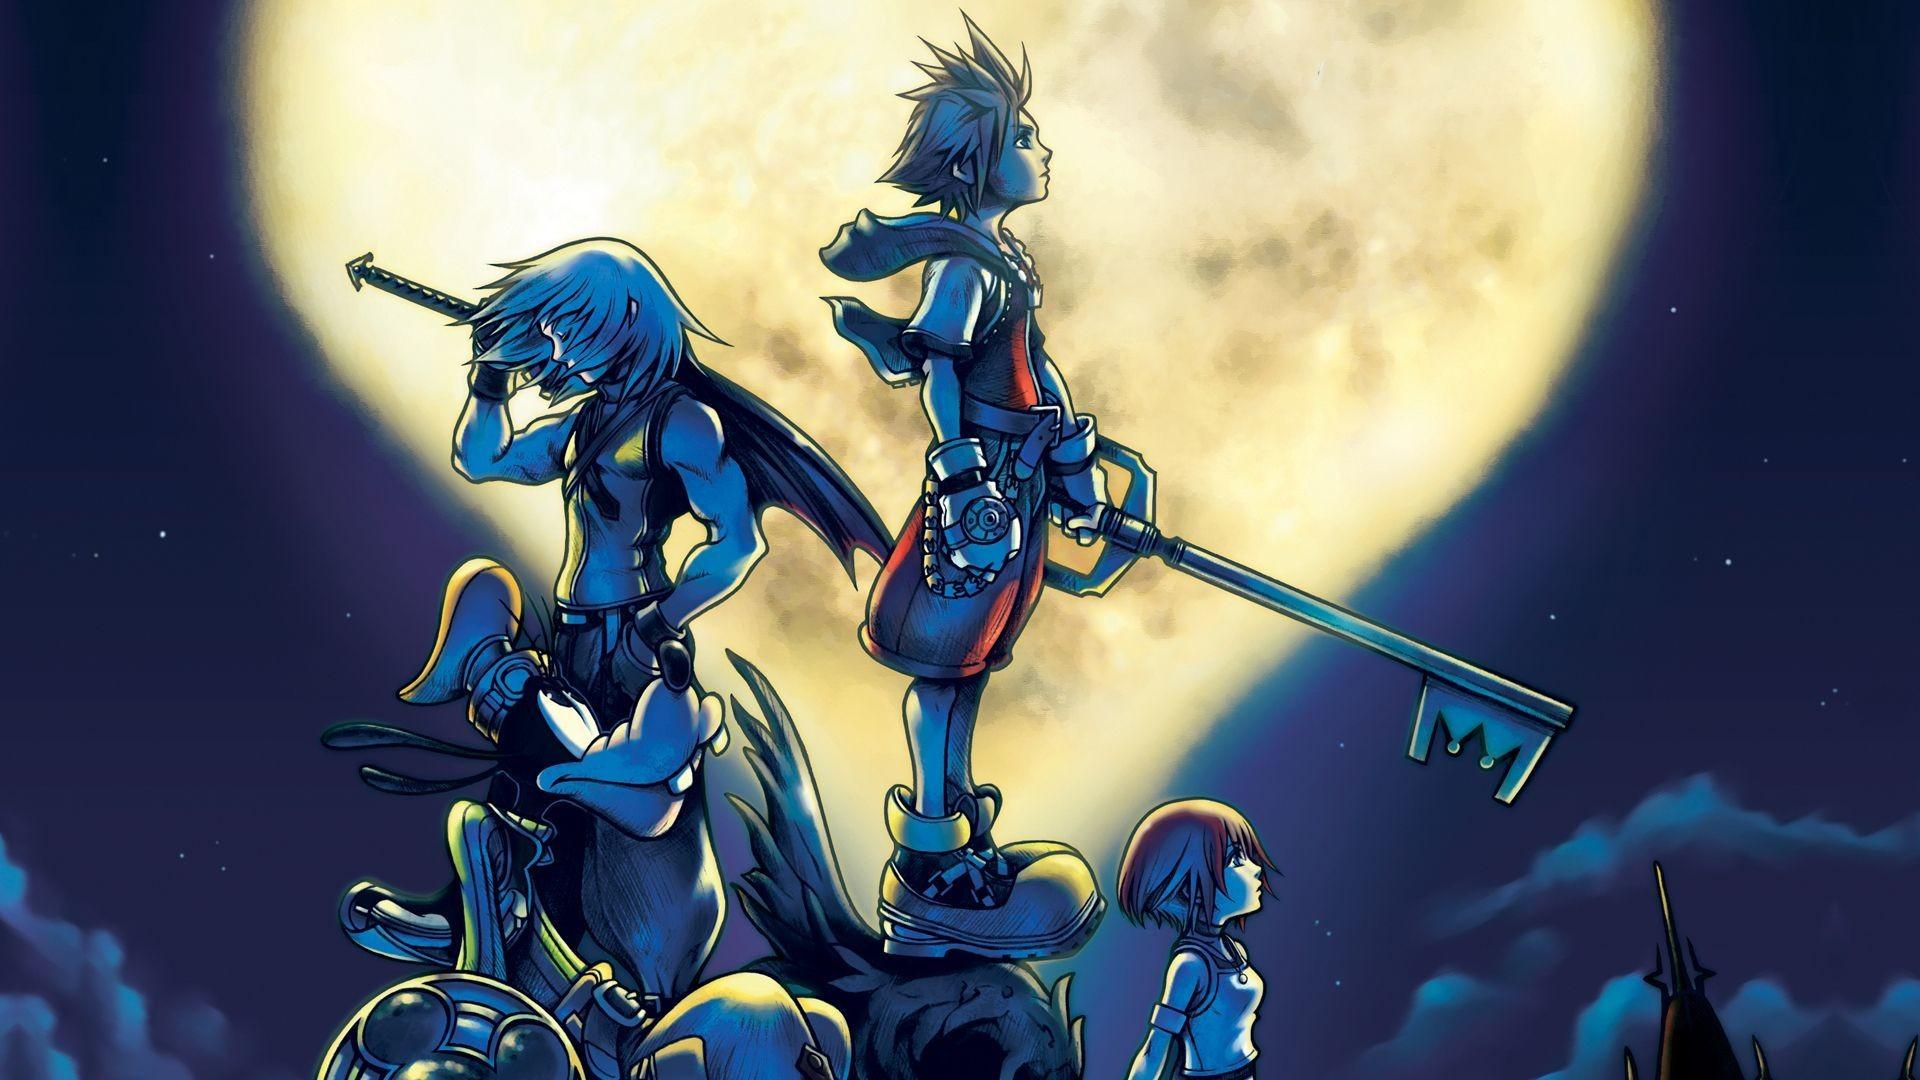 Kingdom Hearts Sora Wallpaper 1920x1080 Kingdom Hearts 2 Roxas...